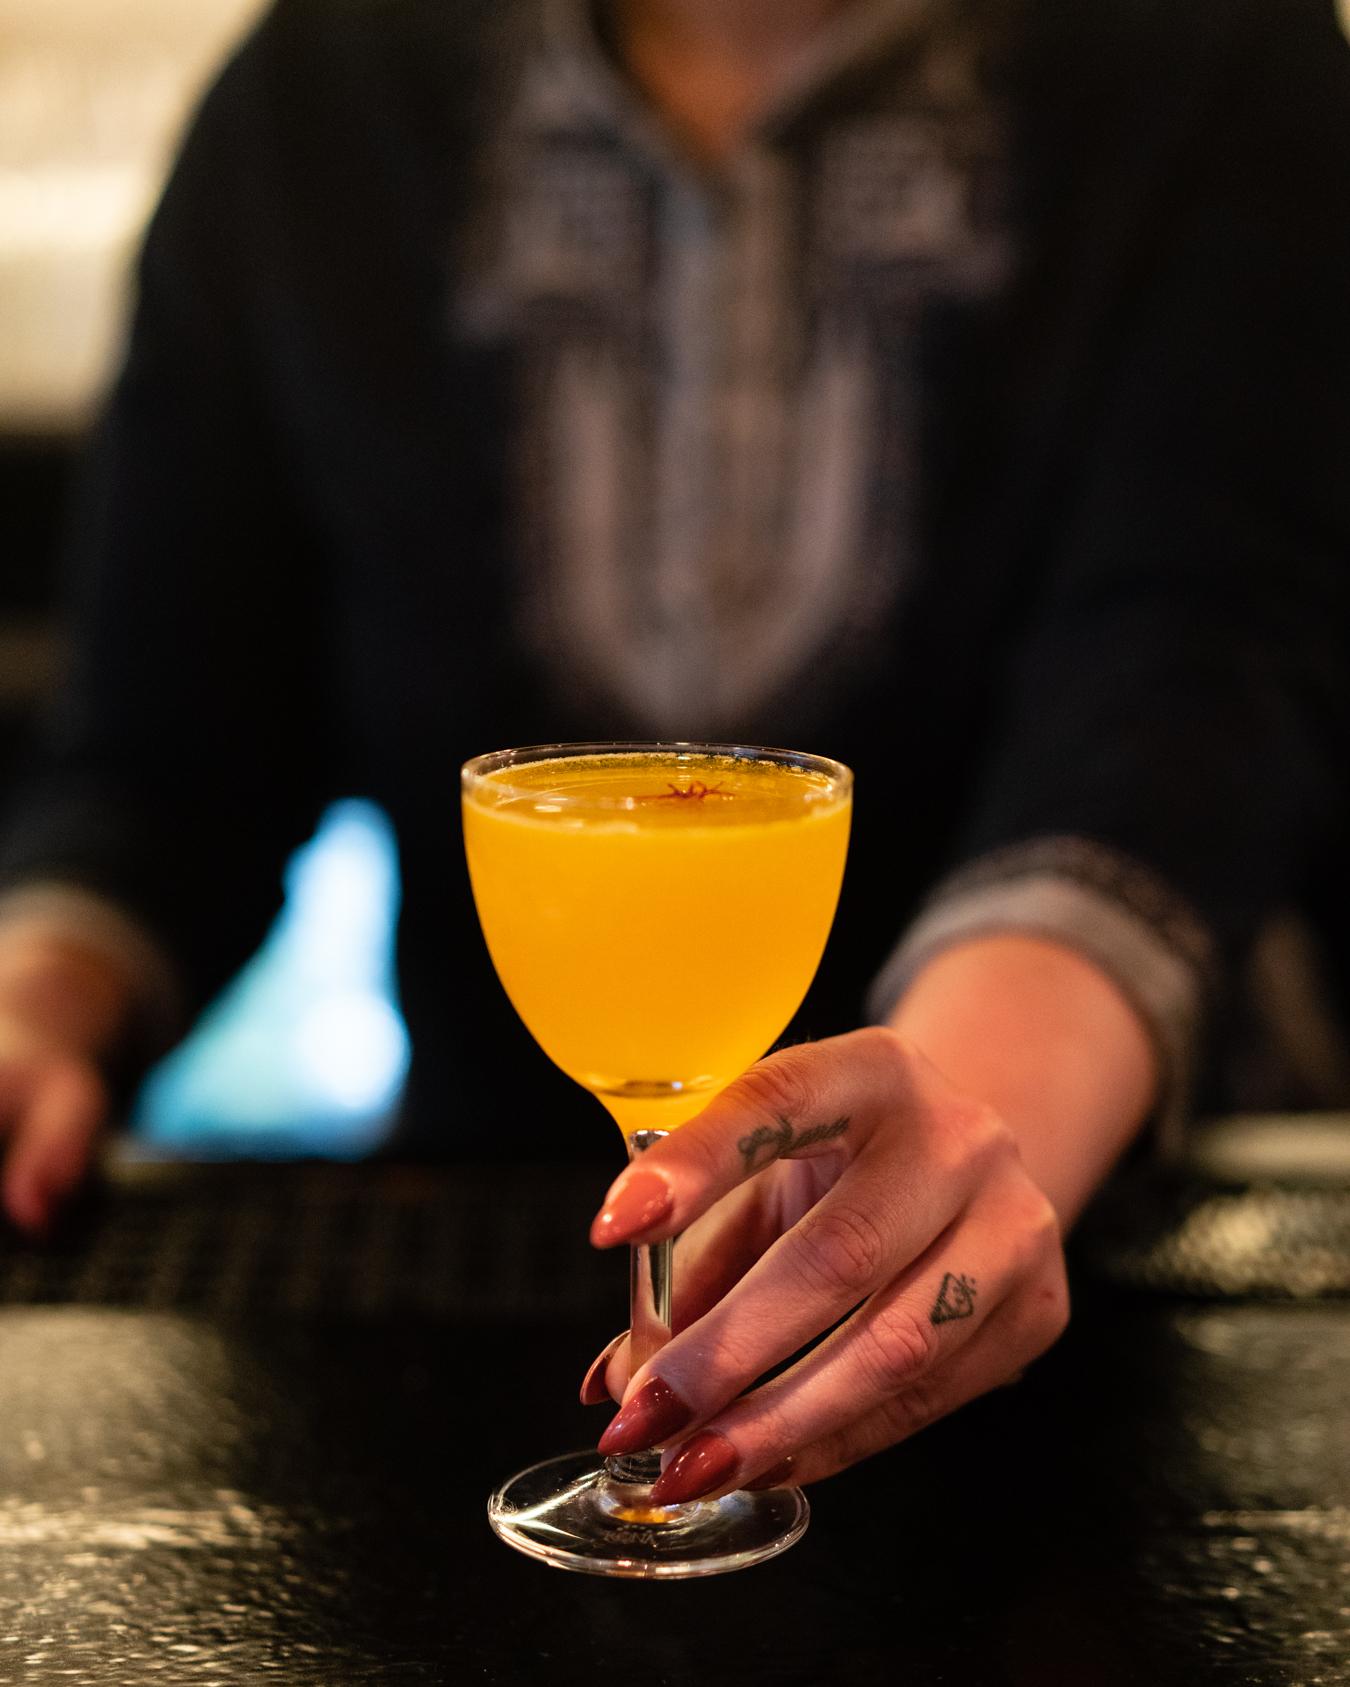 Saffron Cocktail at Berber in Russian Hill